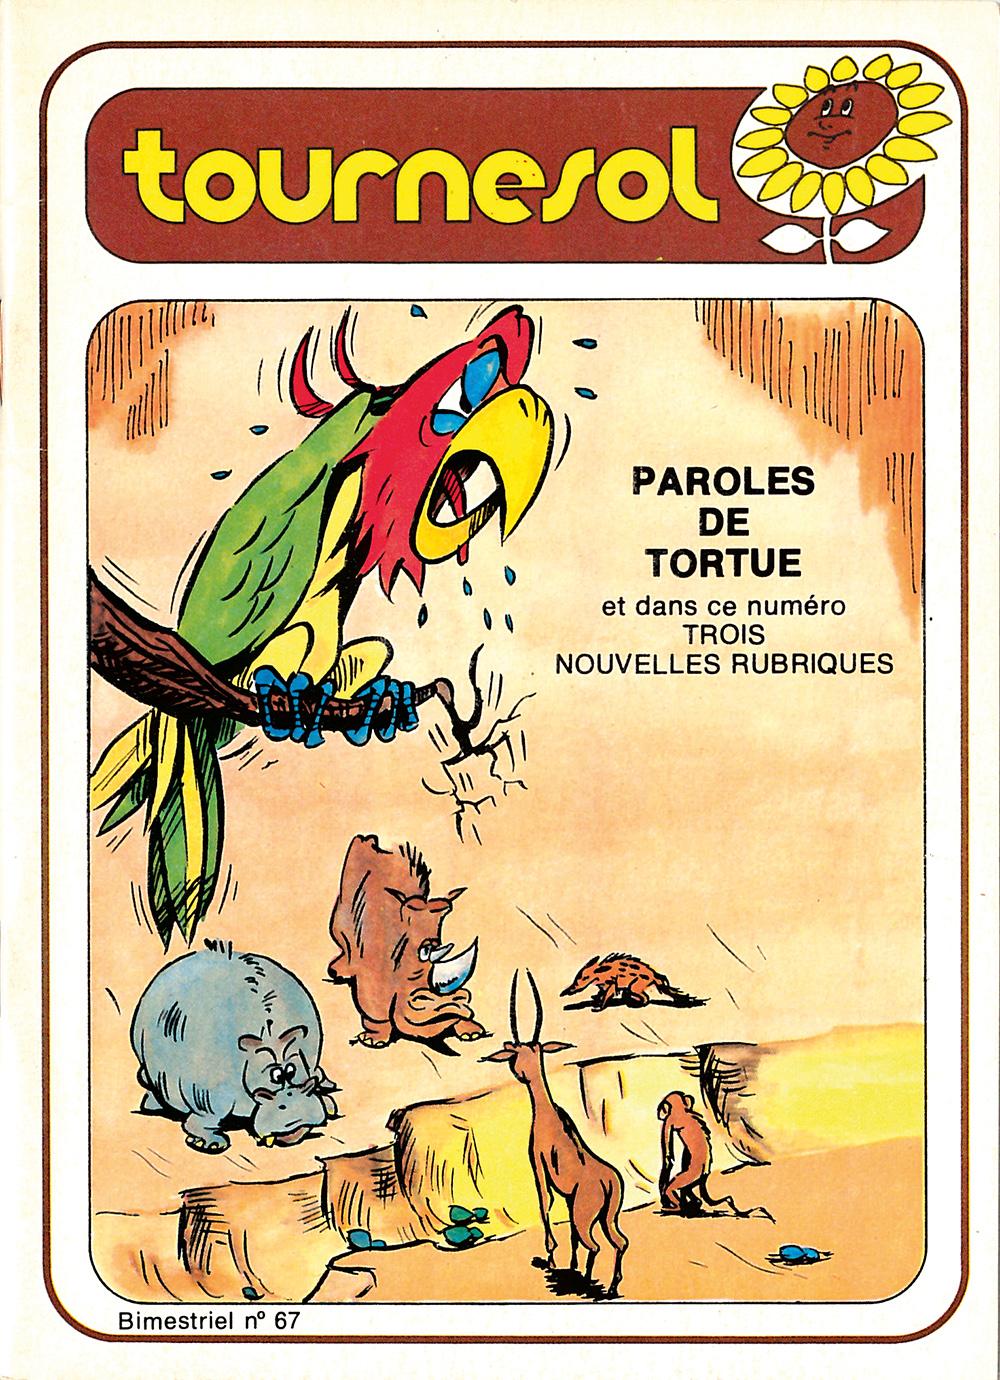 Tournesol - 1978